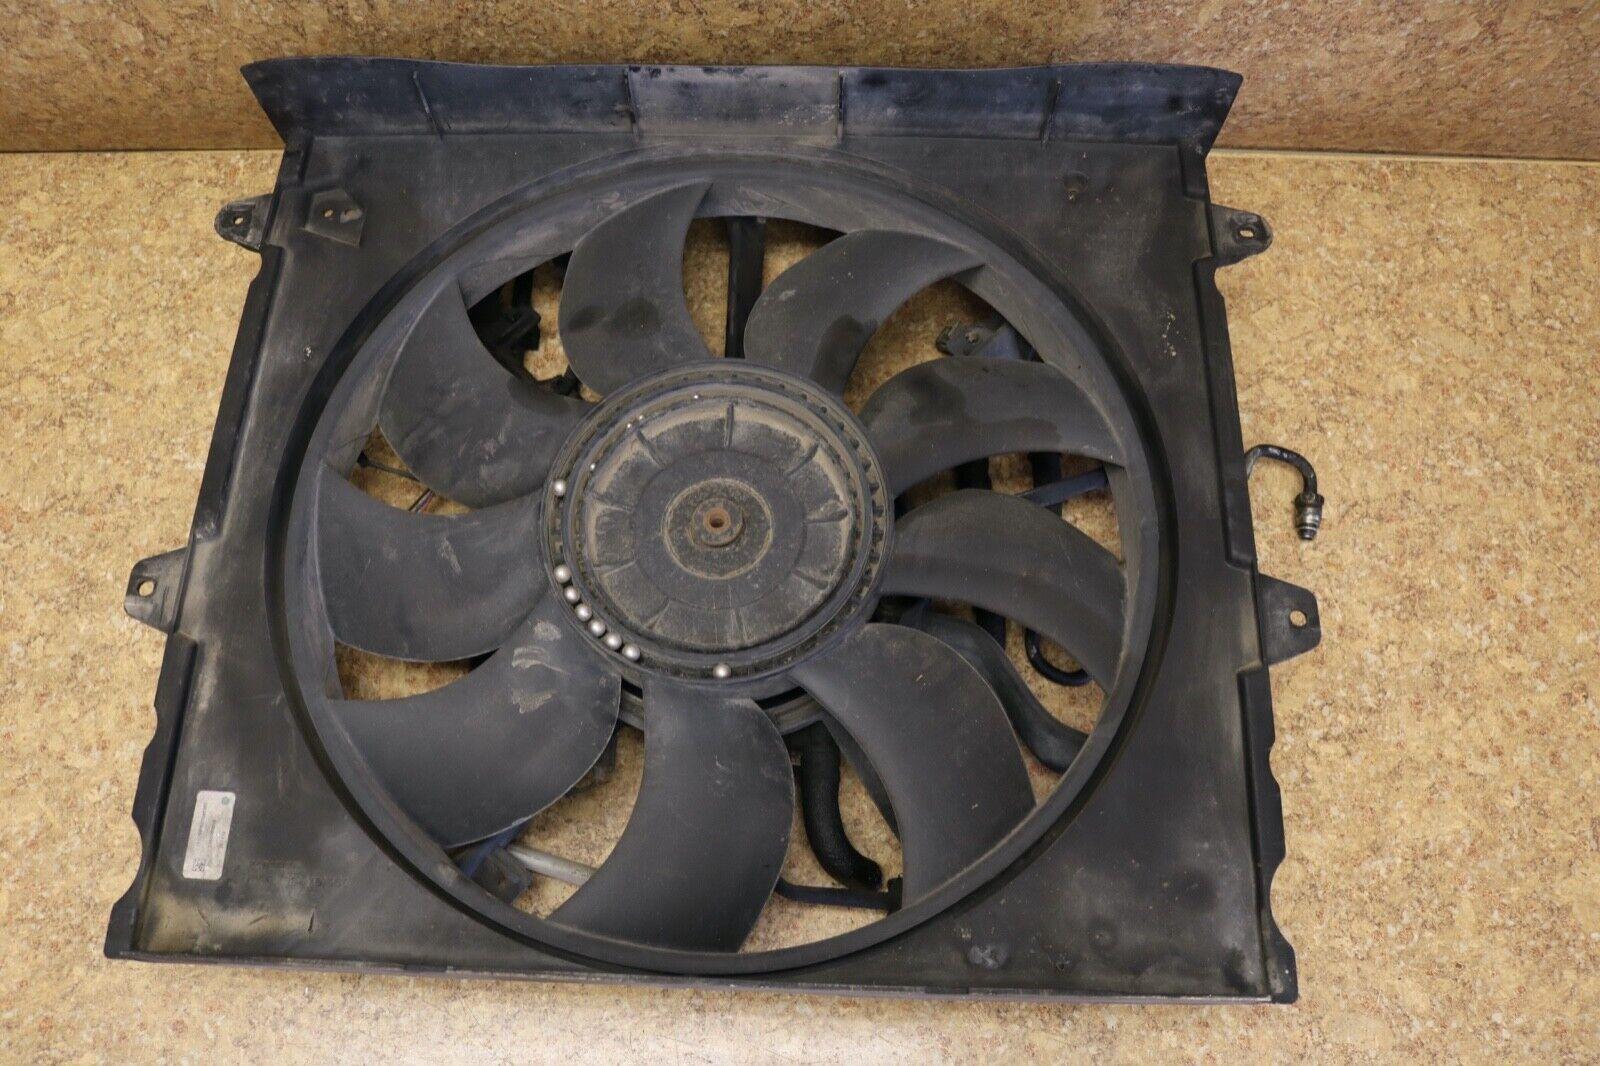 NOS OEM Mopar 52003248 Coolant System Tee 87-90 JEEP Cherokee Wrangler Wagoneer